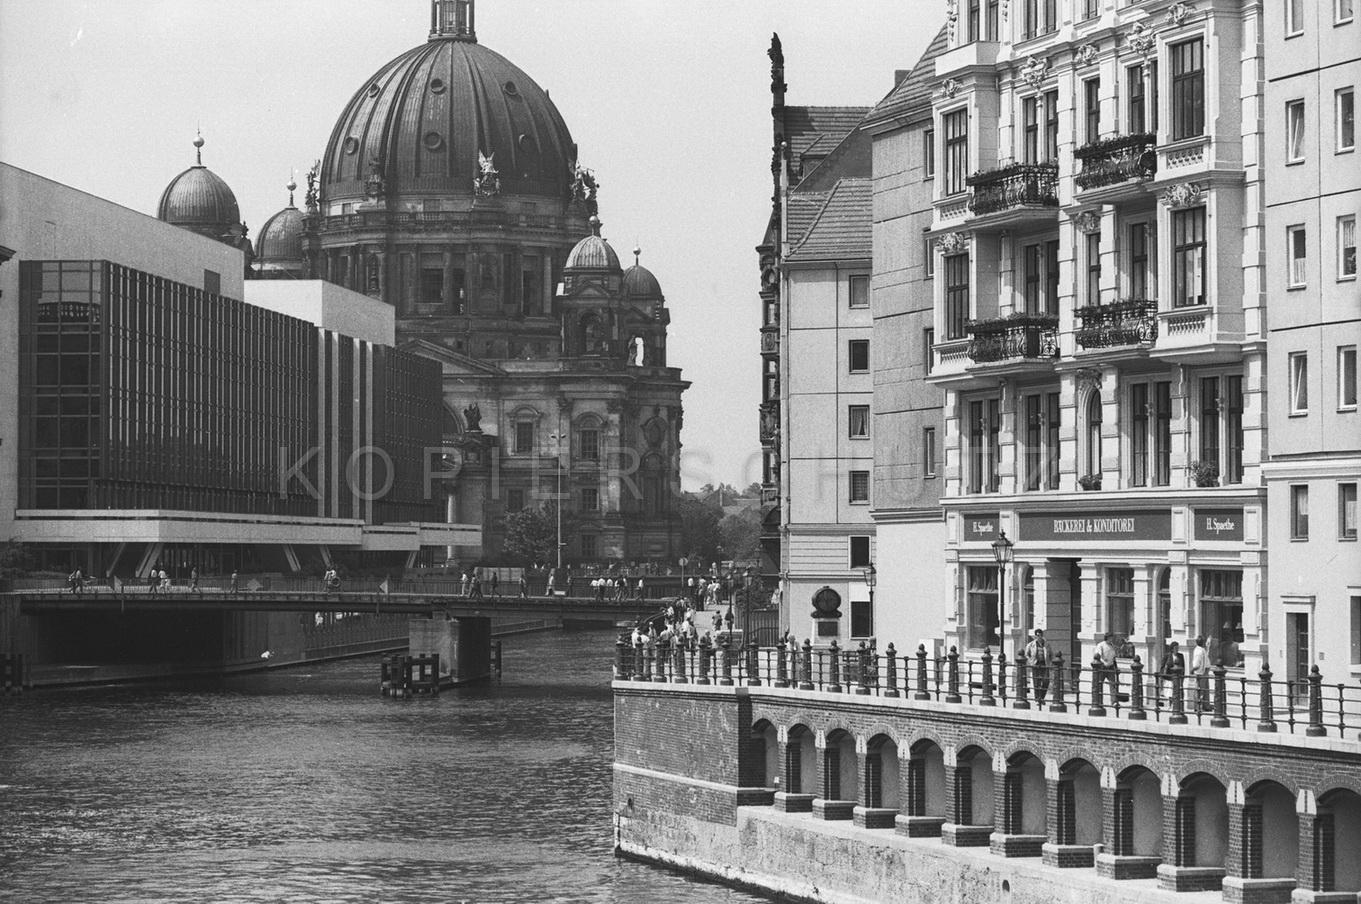 Nr01-090_Palast-der-Republik-20.6.1988